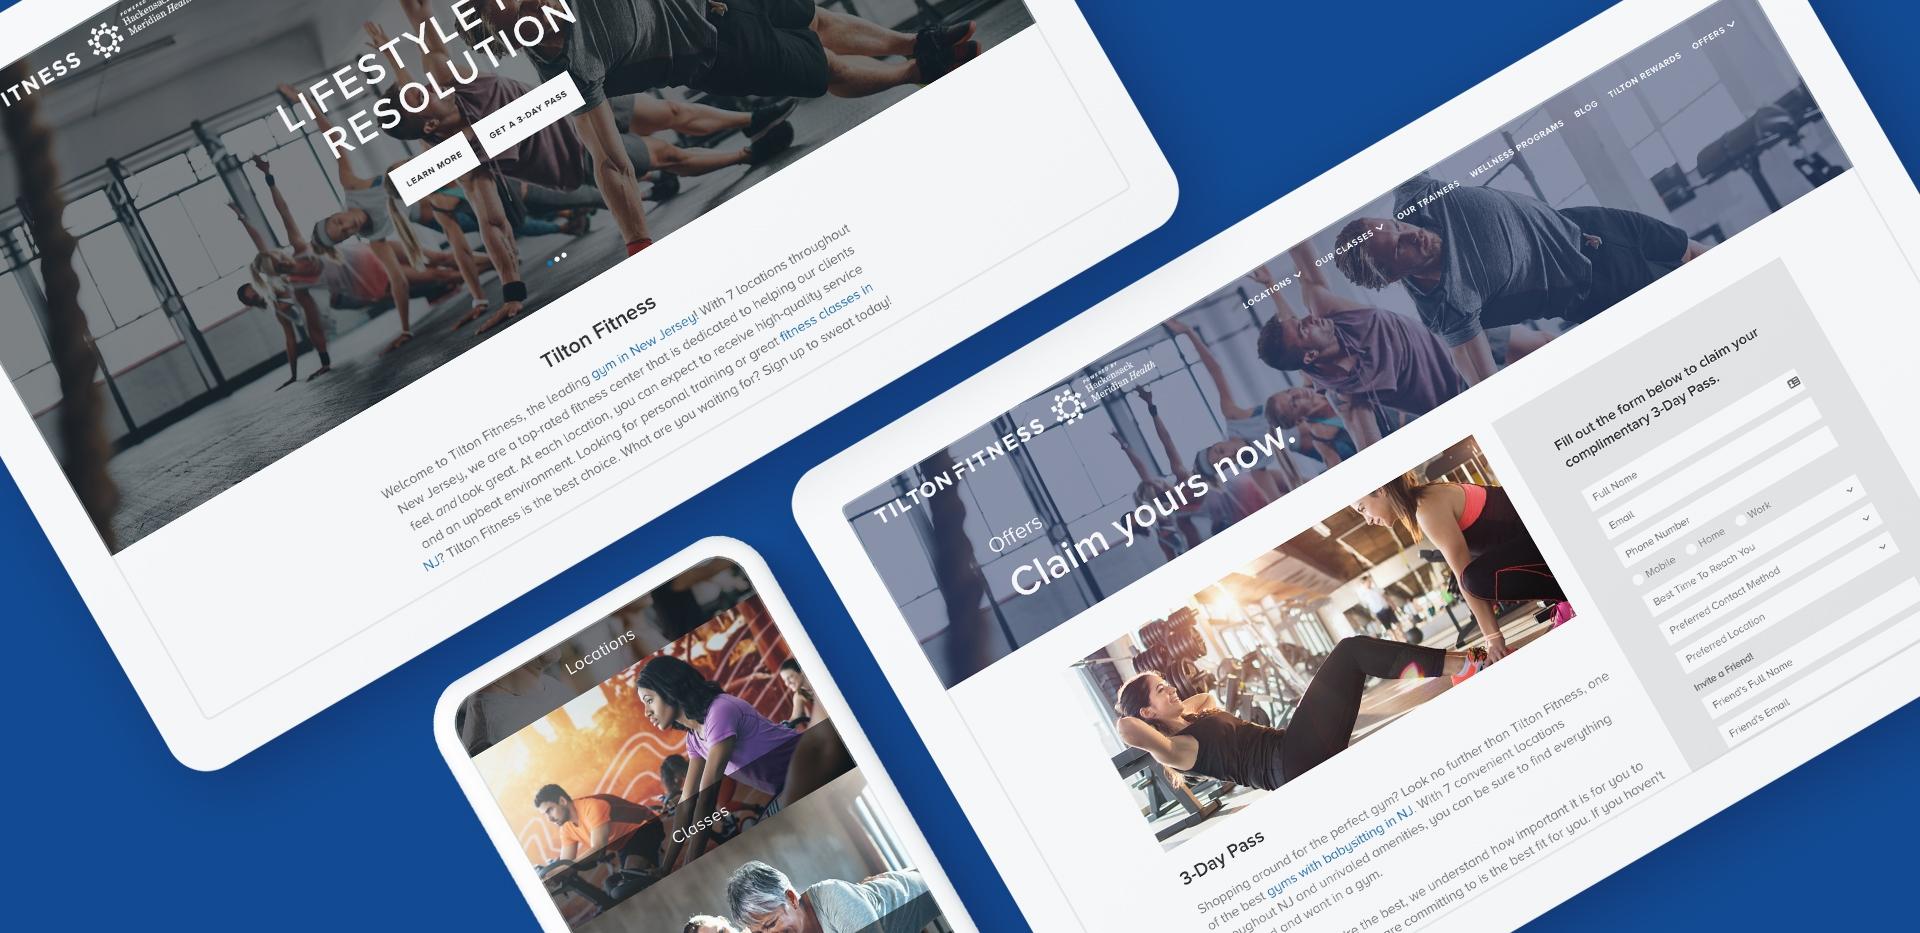 tilton fitness custom website design mock up shown on tablet and mobile phone